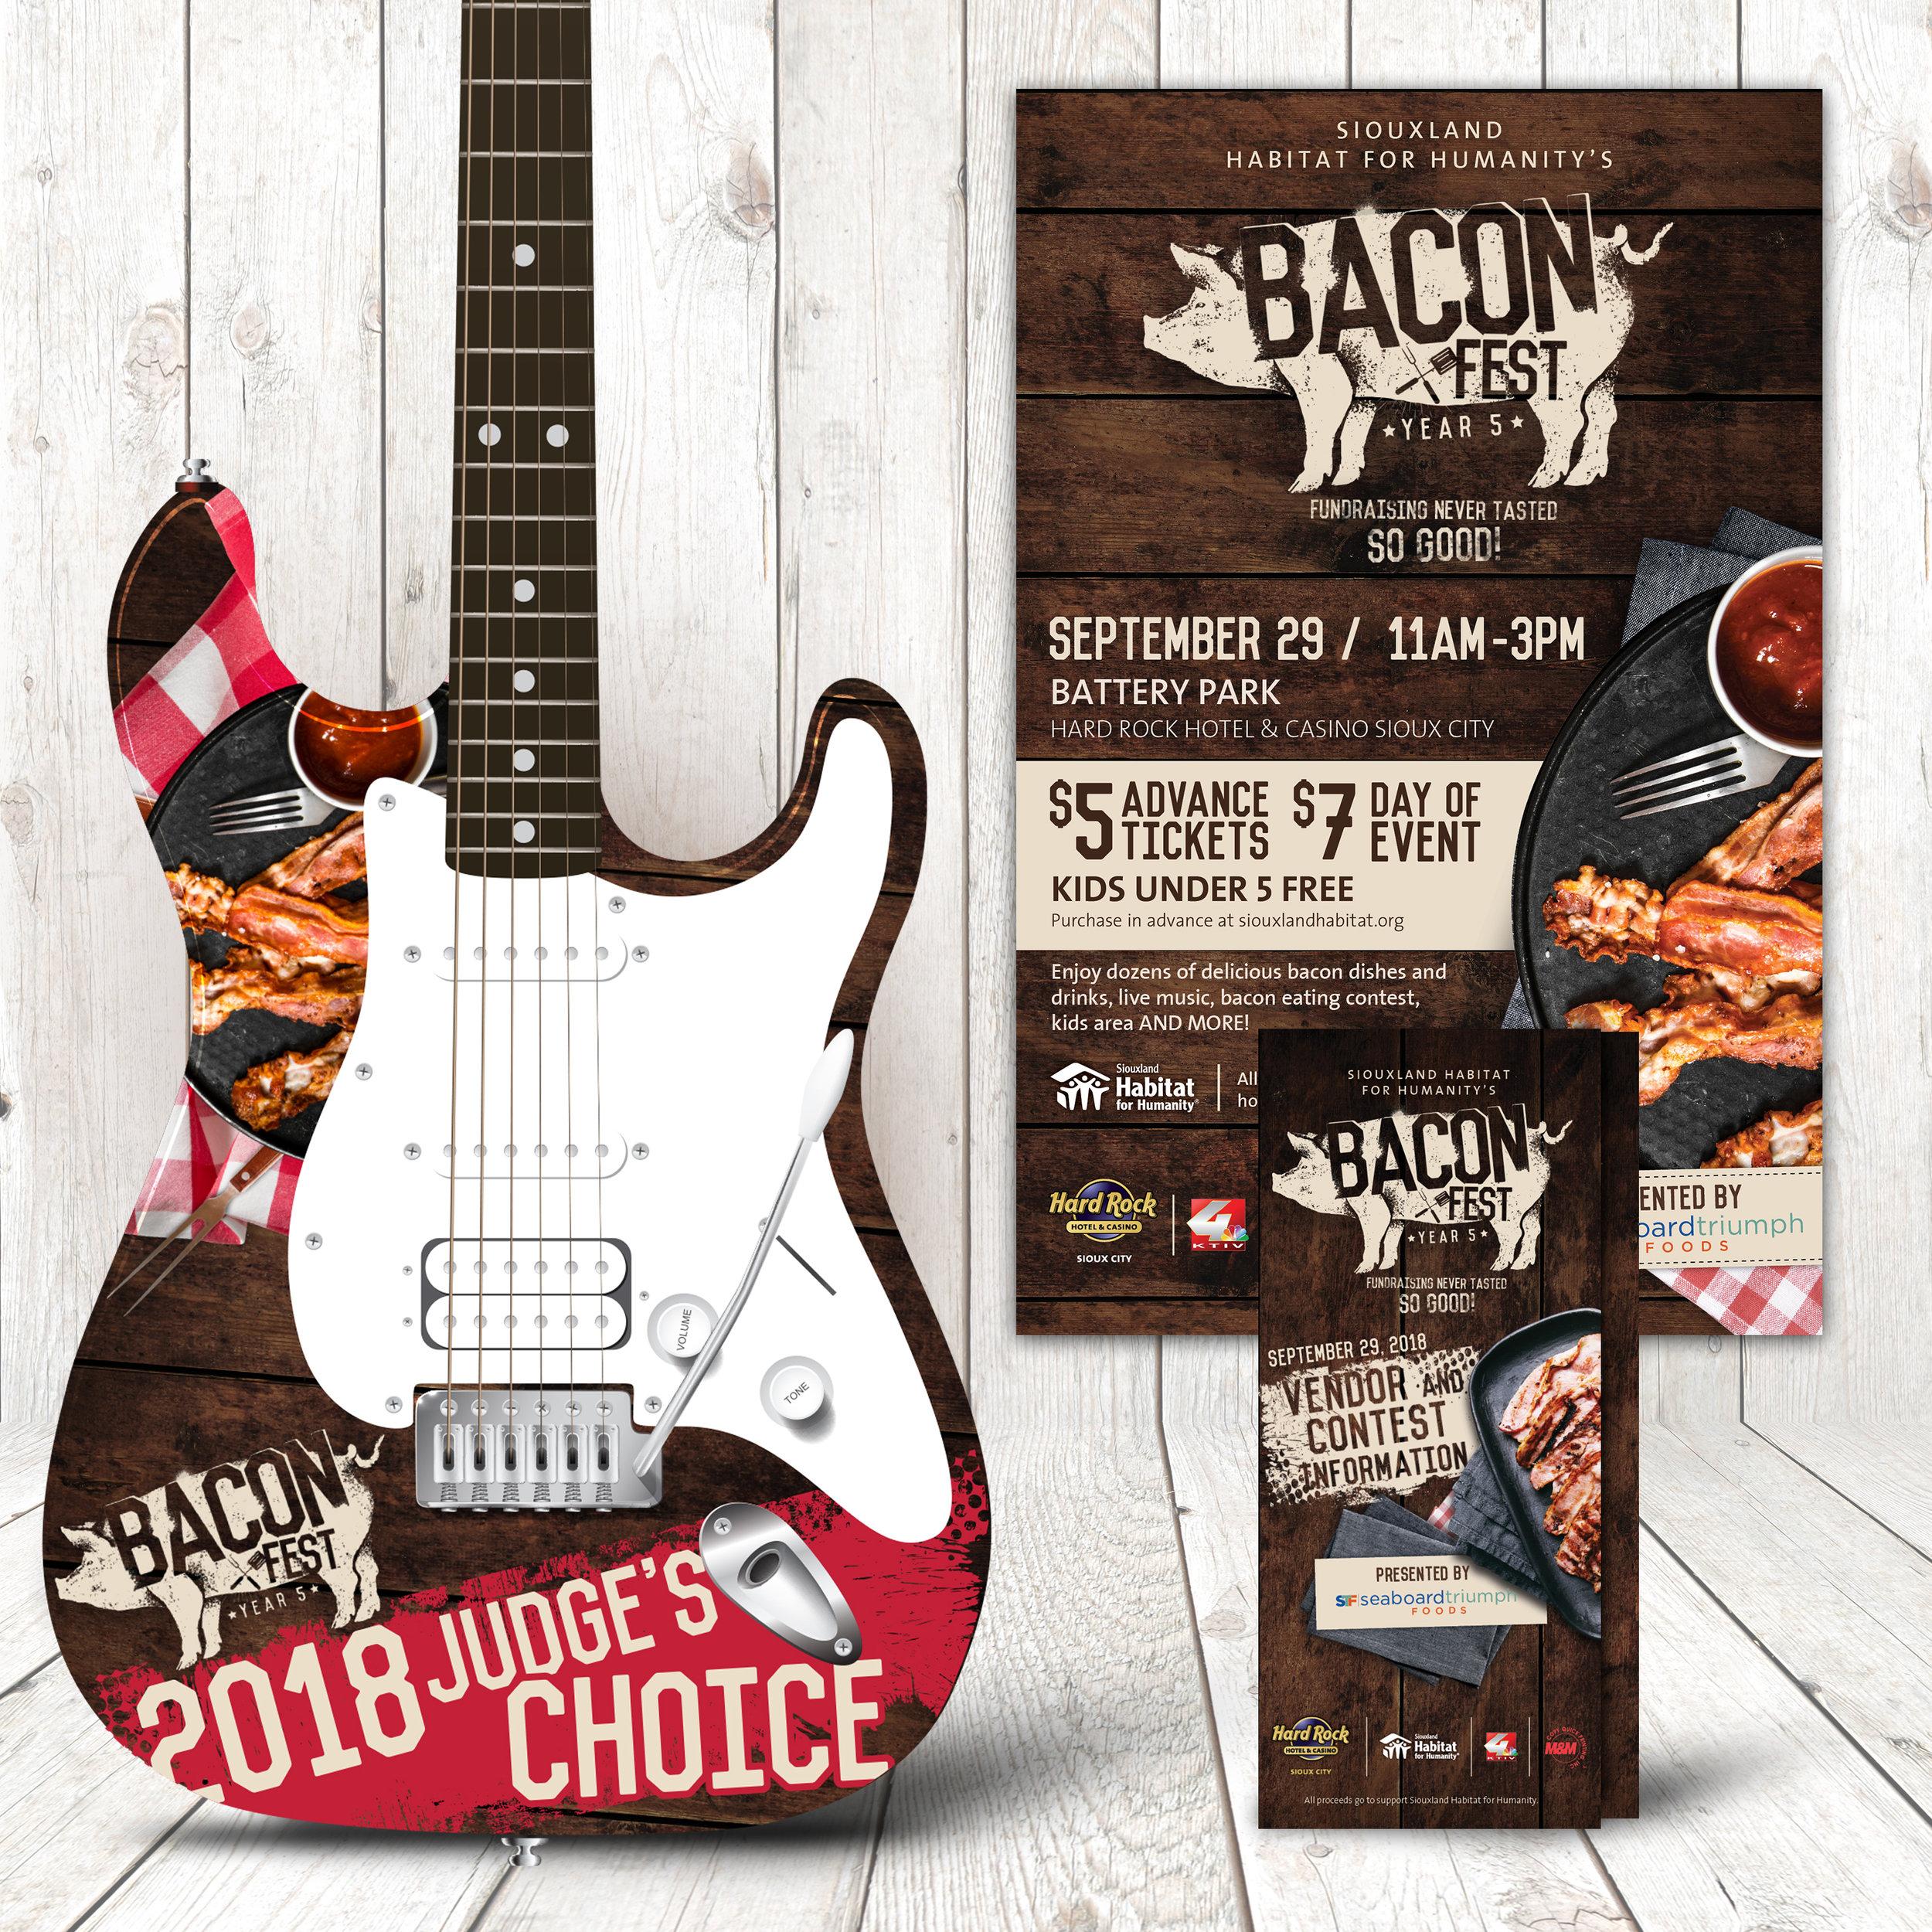 Hard Rock Hotel & Casino Sioux City: Bacon Fest